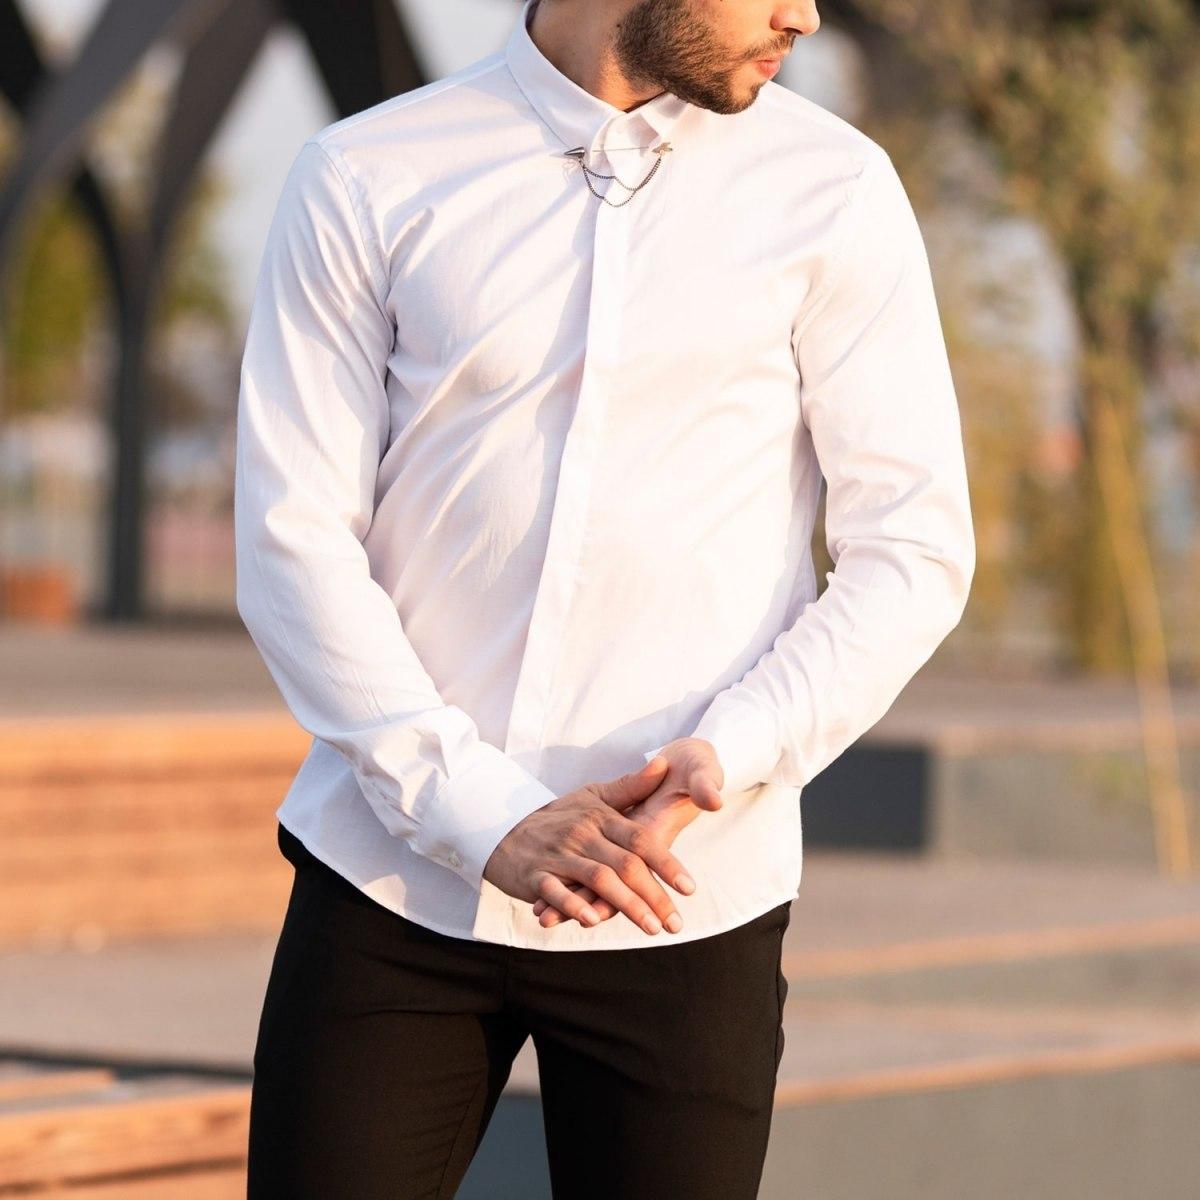 Men's Long Sleeve Shirt With Lapel Pin In White Mv Premium Brand - 1